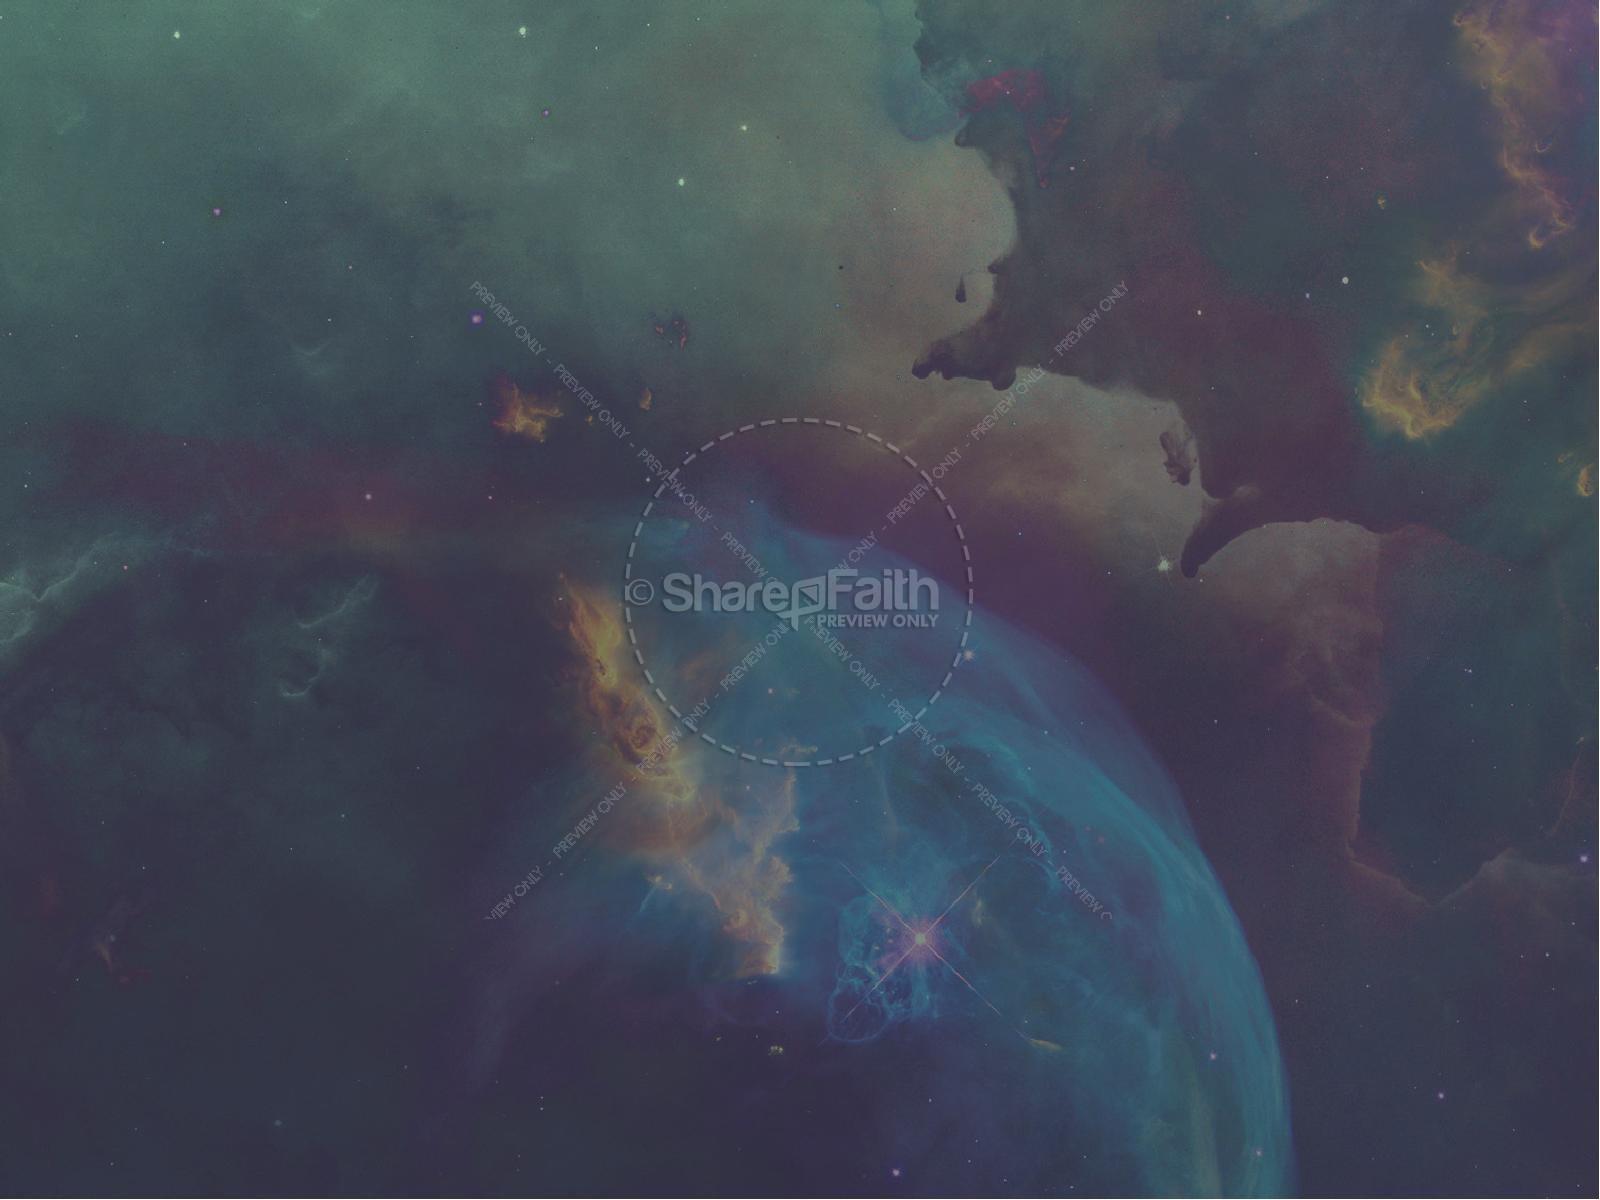 Genesis In The Beginning Sermon Graphic | slide 7